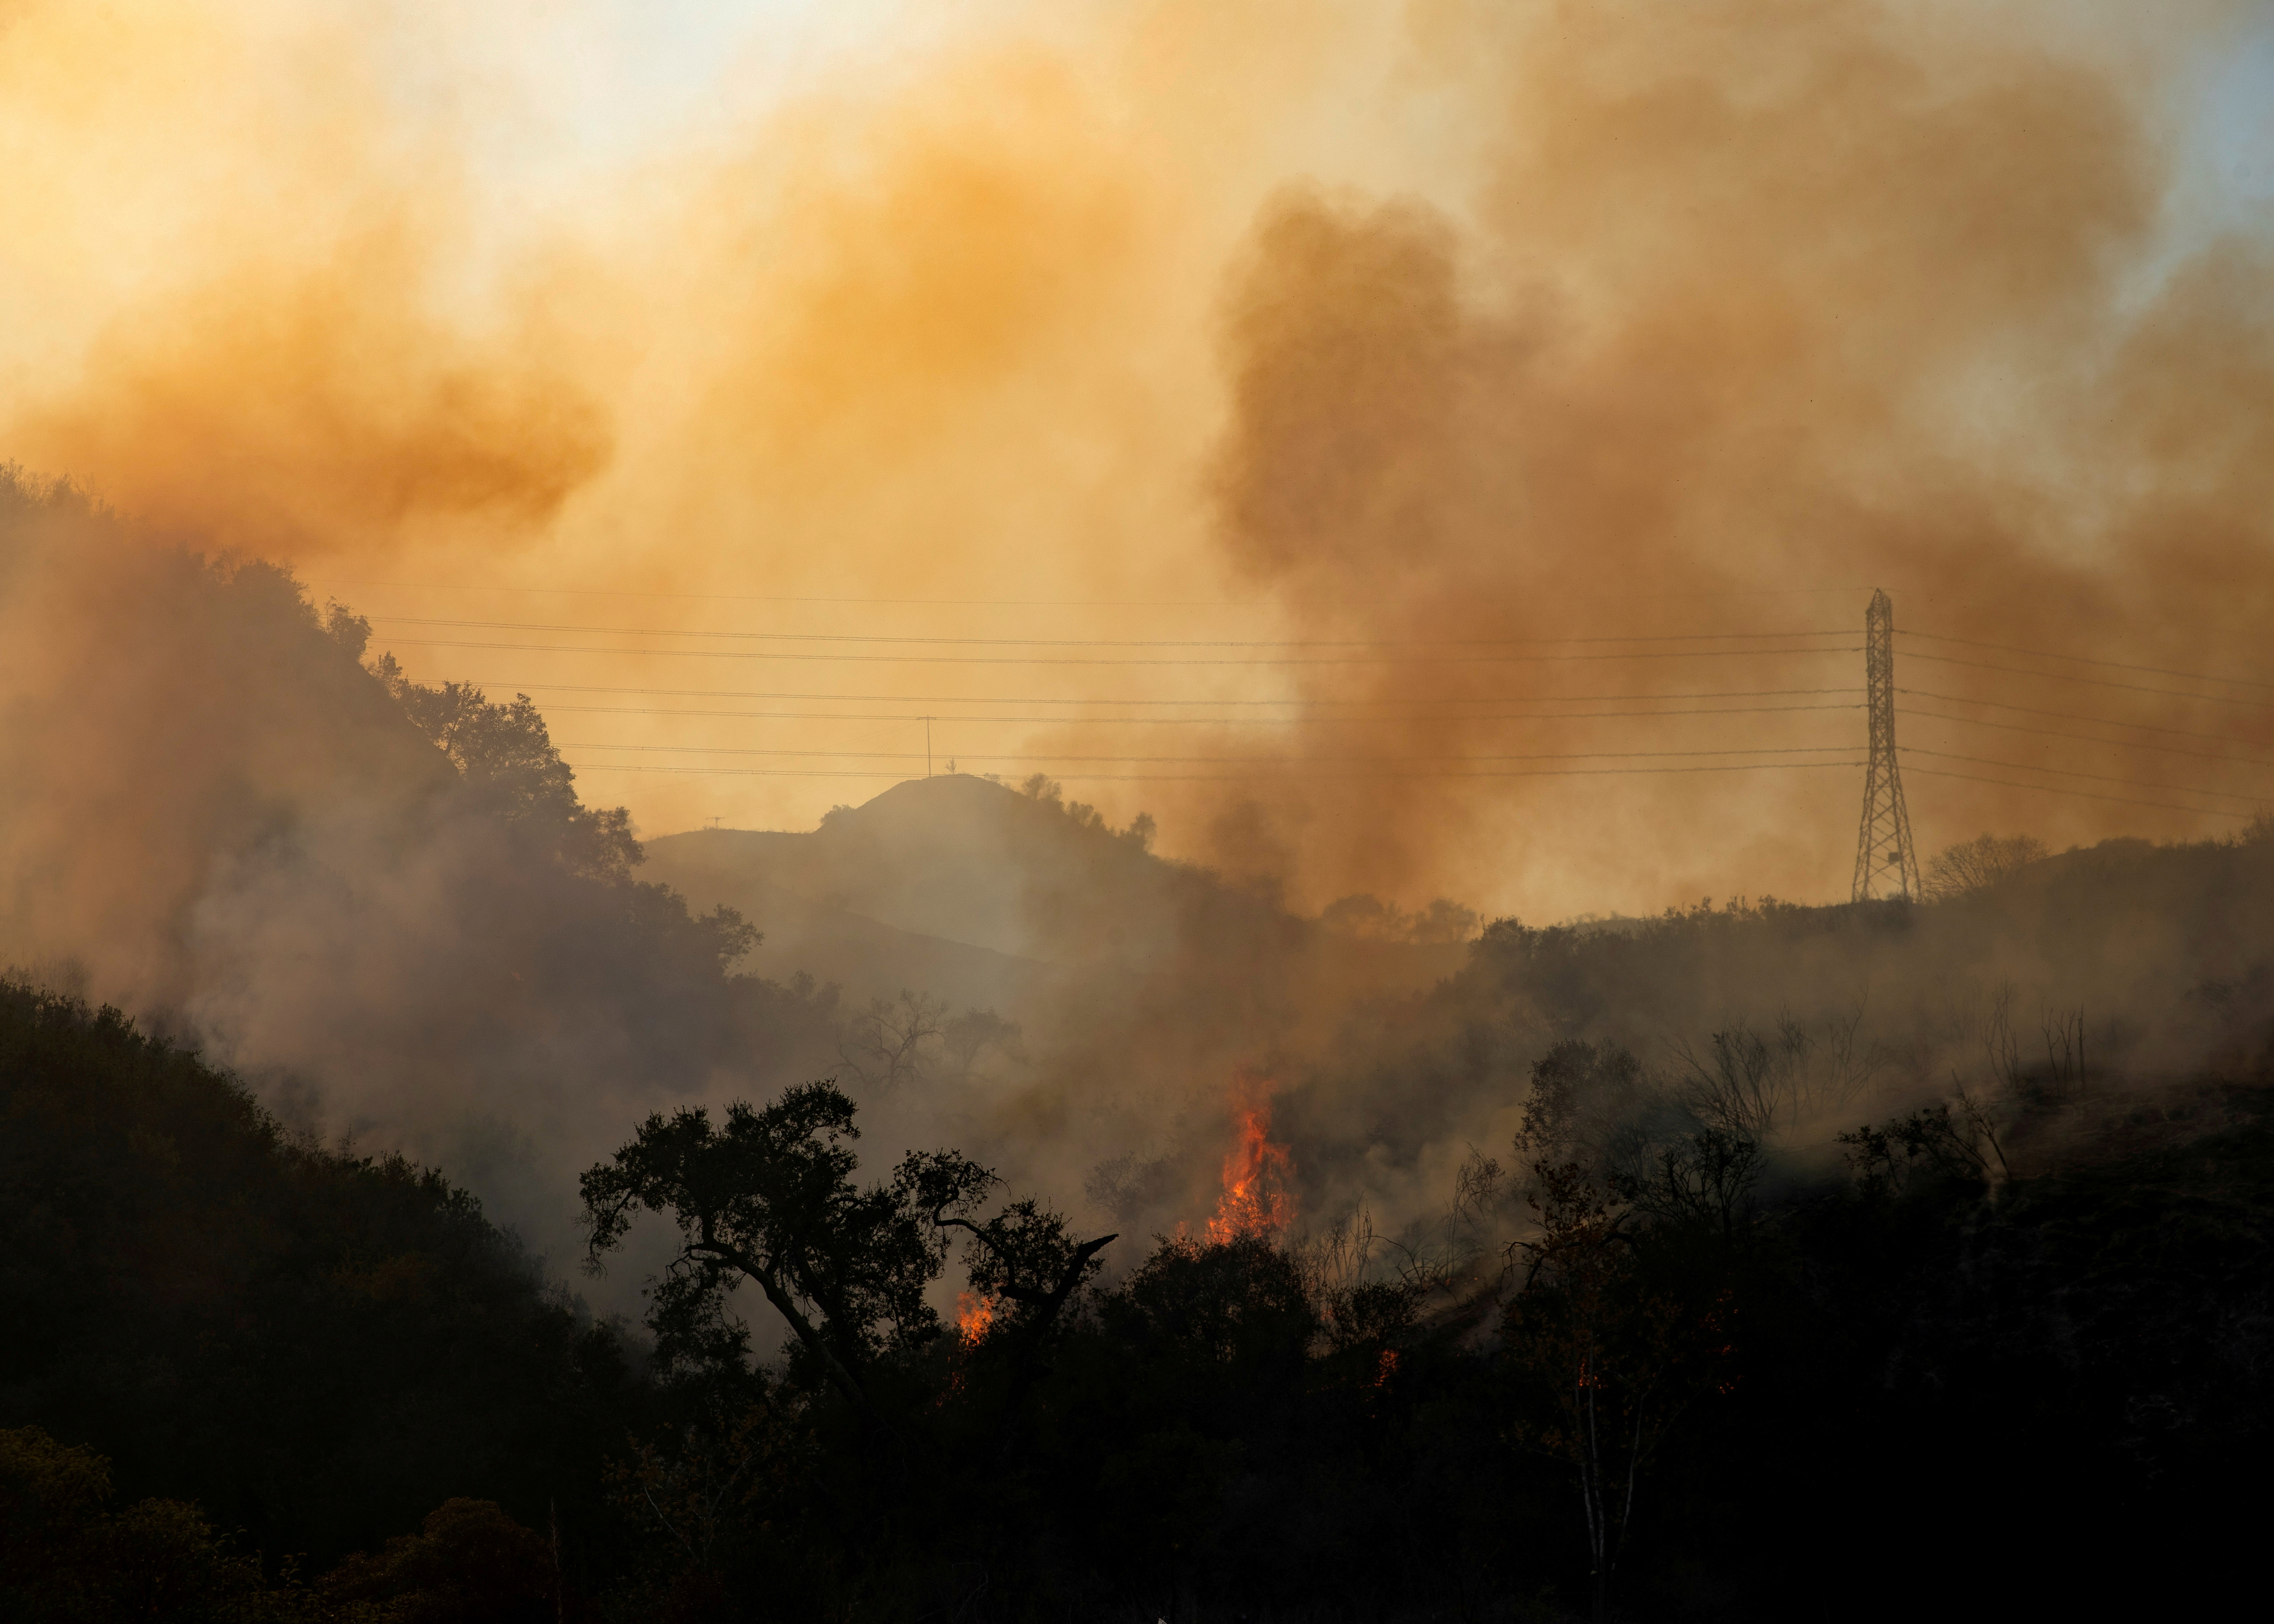 The Bond Fire wildfire burns next to electrical power lines near Modjeska Canyon, California, U.S., December 3, 2020.  REUTERS/Mike Blake